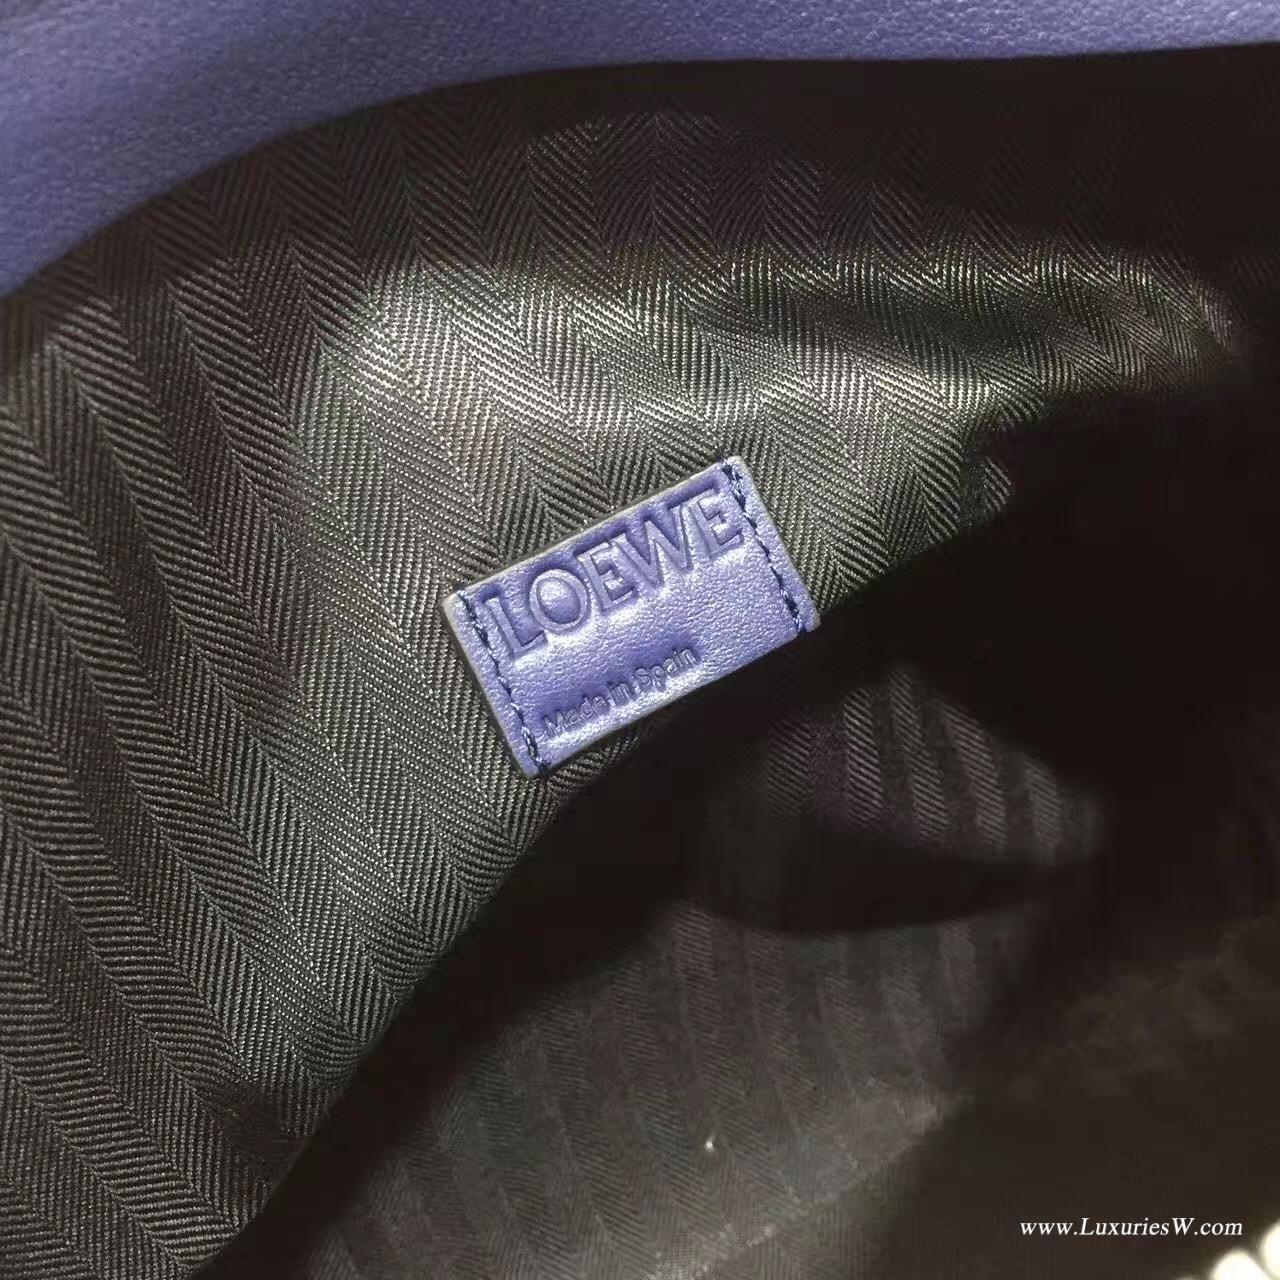 LOEWE羅意威經典小牛皮革 T 信差包海軍藍 T型側邊結構